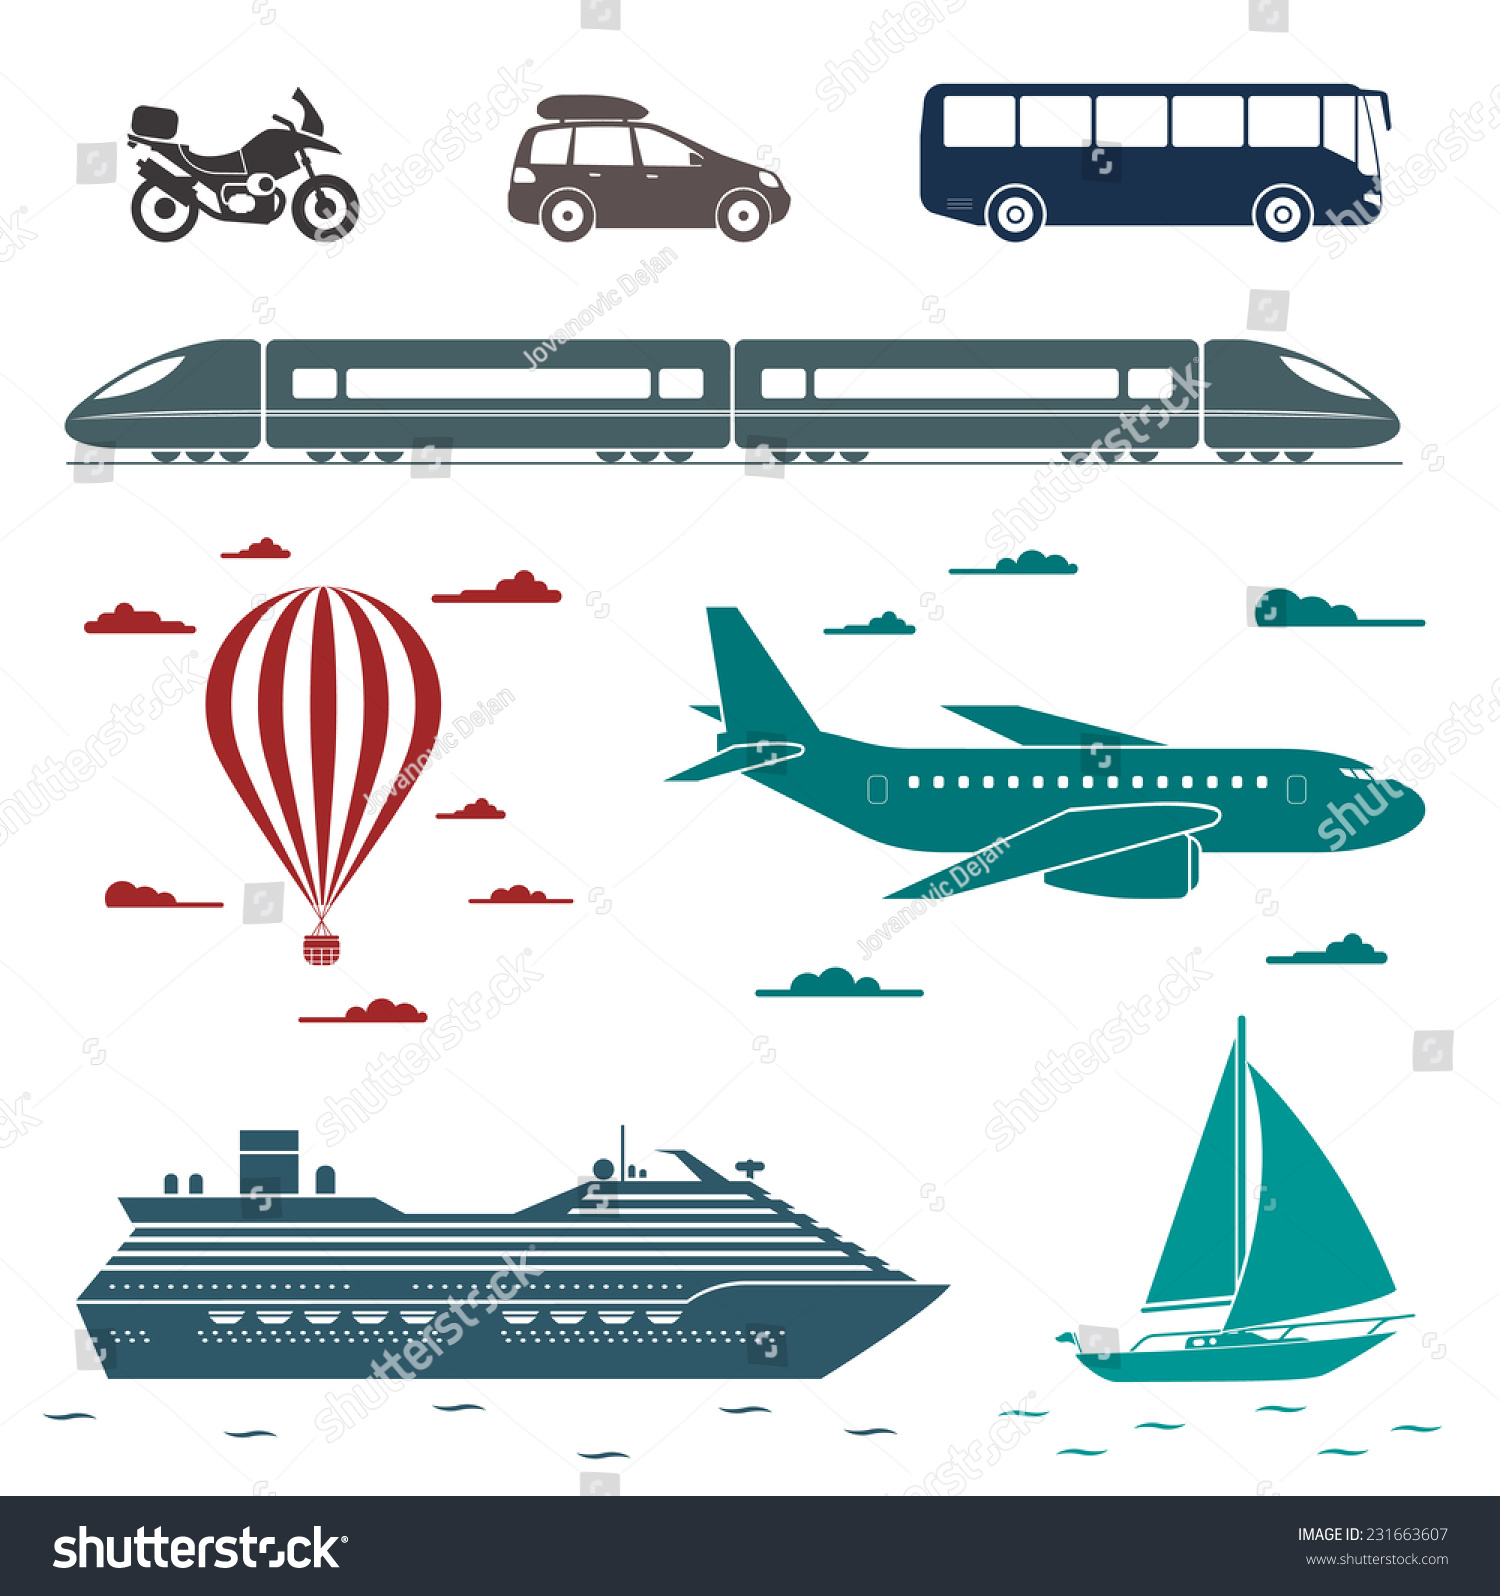 Various Types Transport Car Bus Train Stock Vector 231663607 - Shutterstock